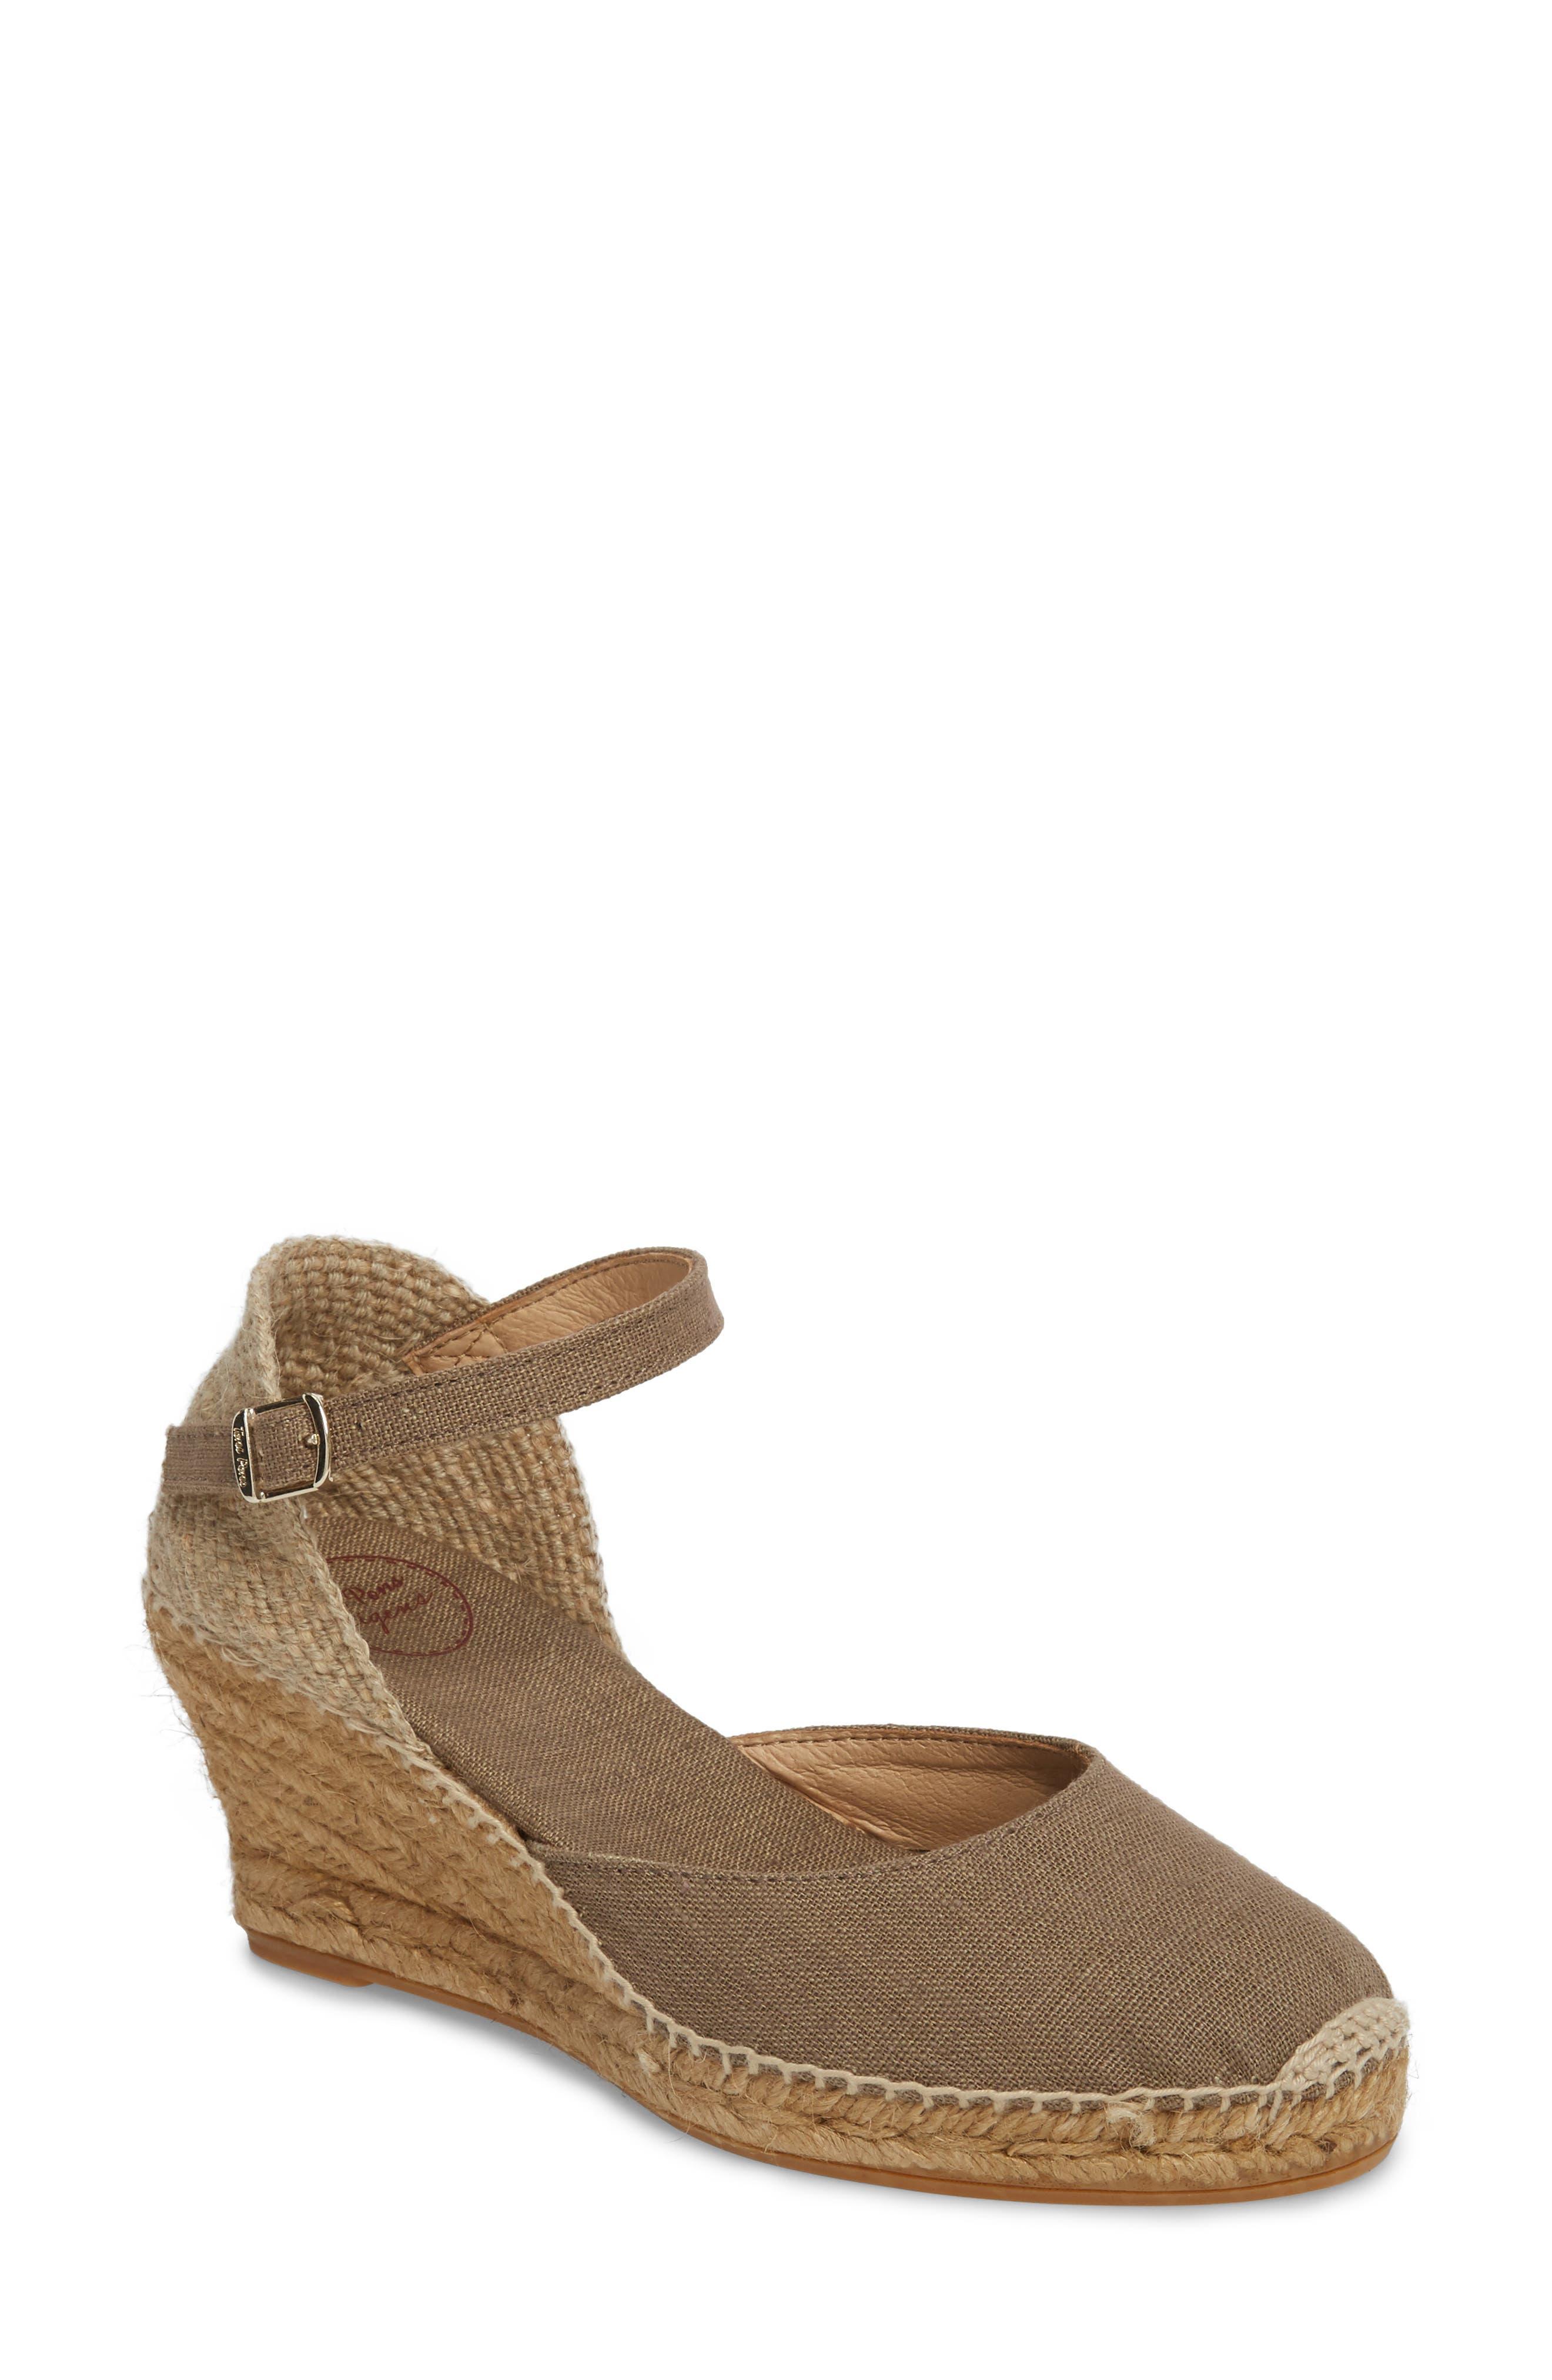 Alternate Image 1 Selected - Toni Pons 'Caldes' Linen Wedge Sandal (Women)